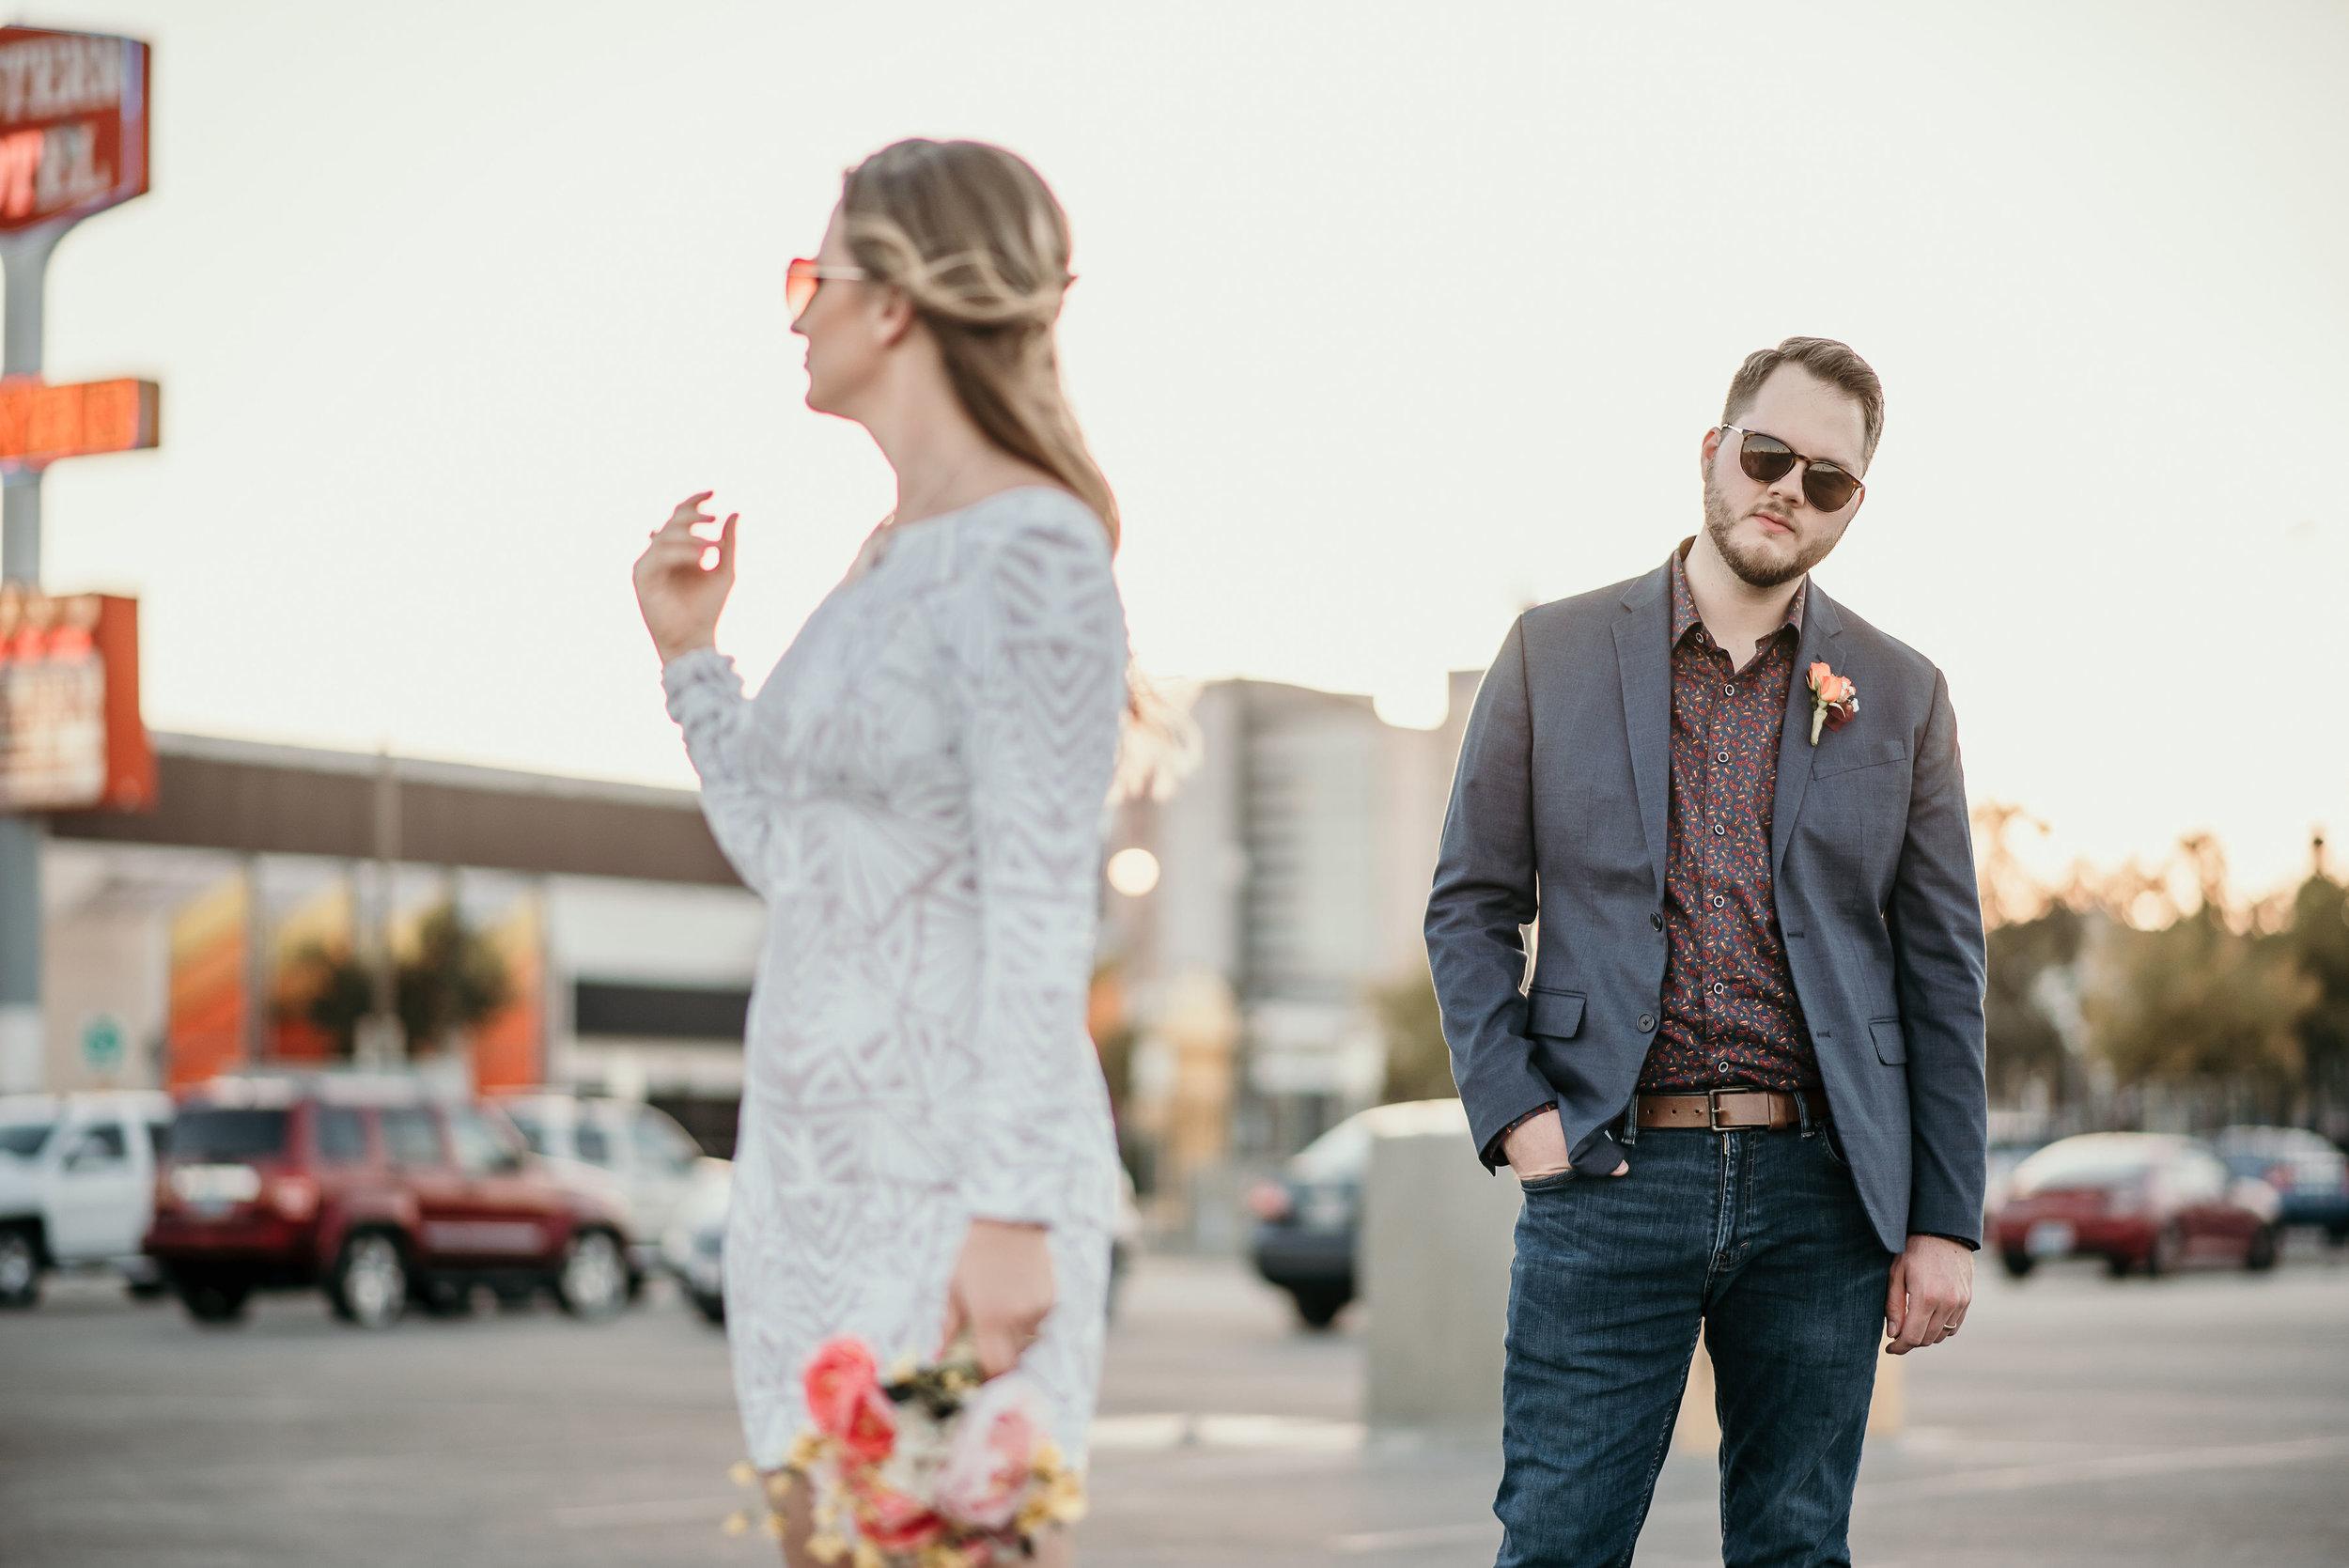 uprooted-traveler-vegas-wedding-vs-traditional-photo-shoot.jpg